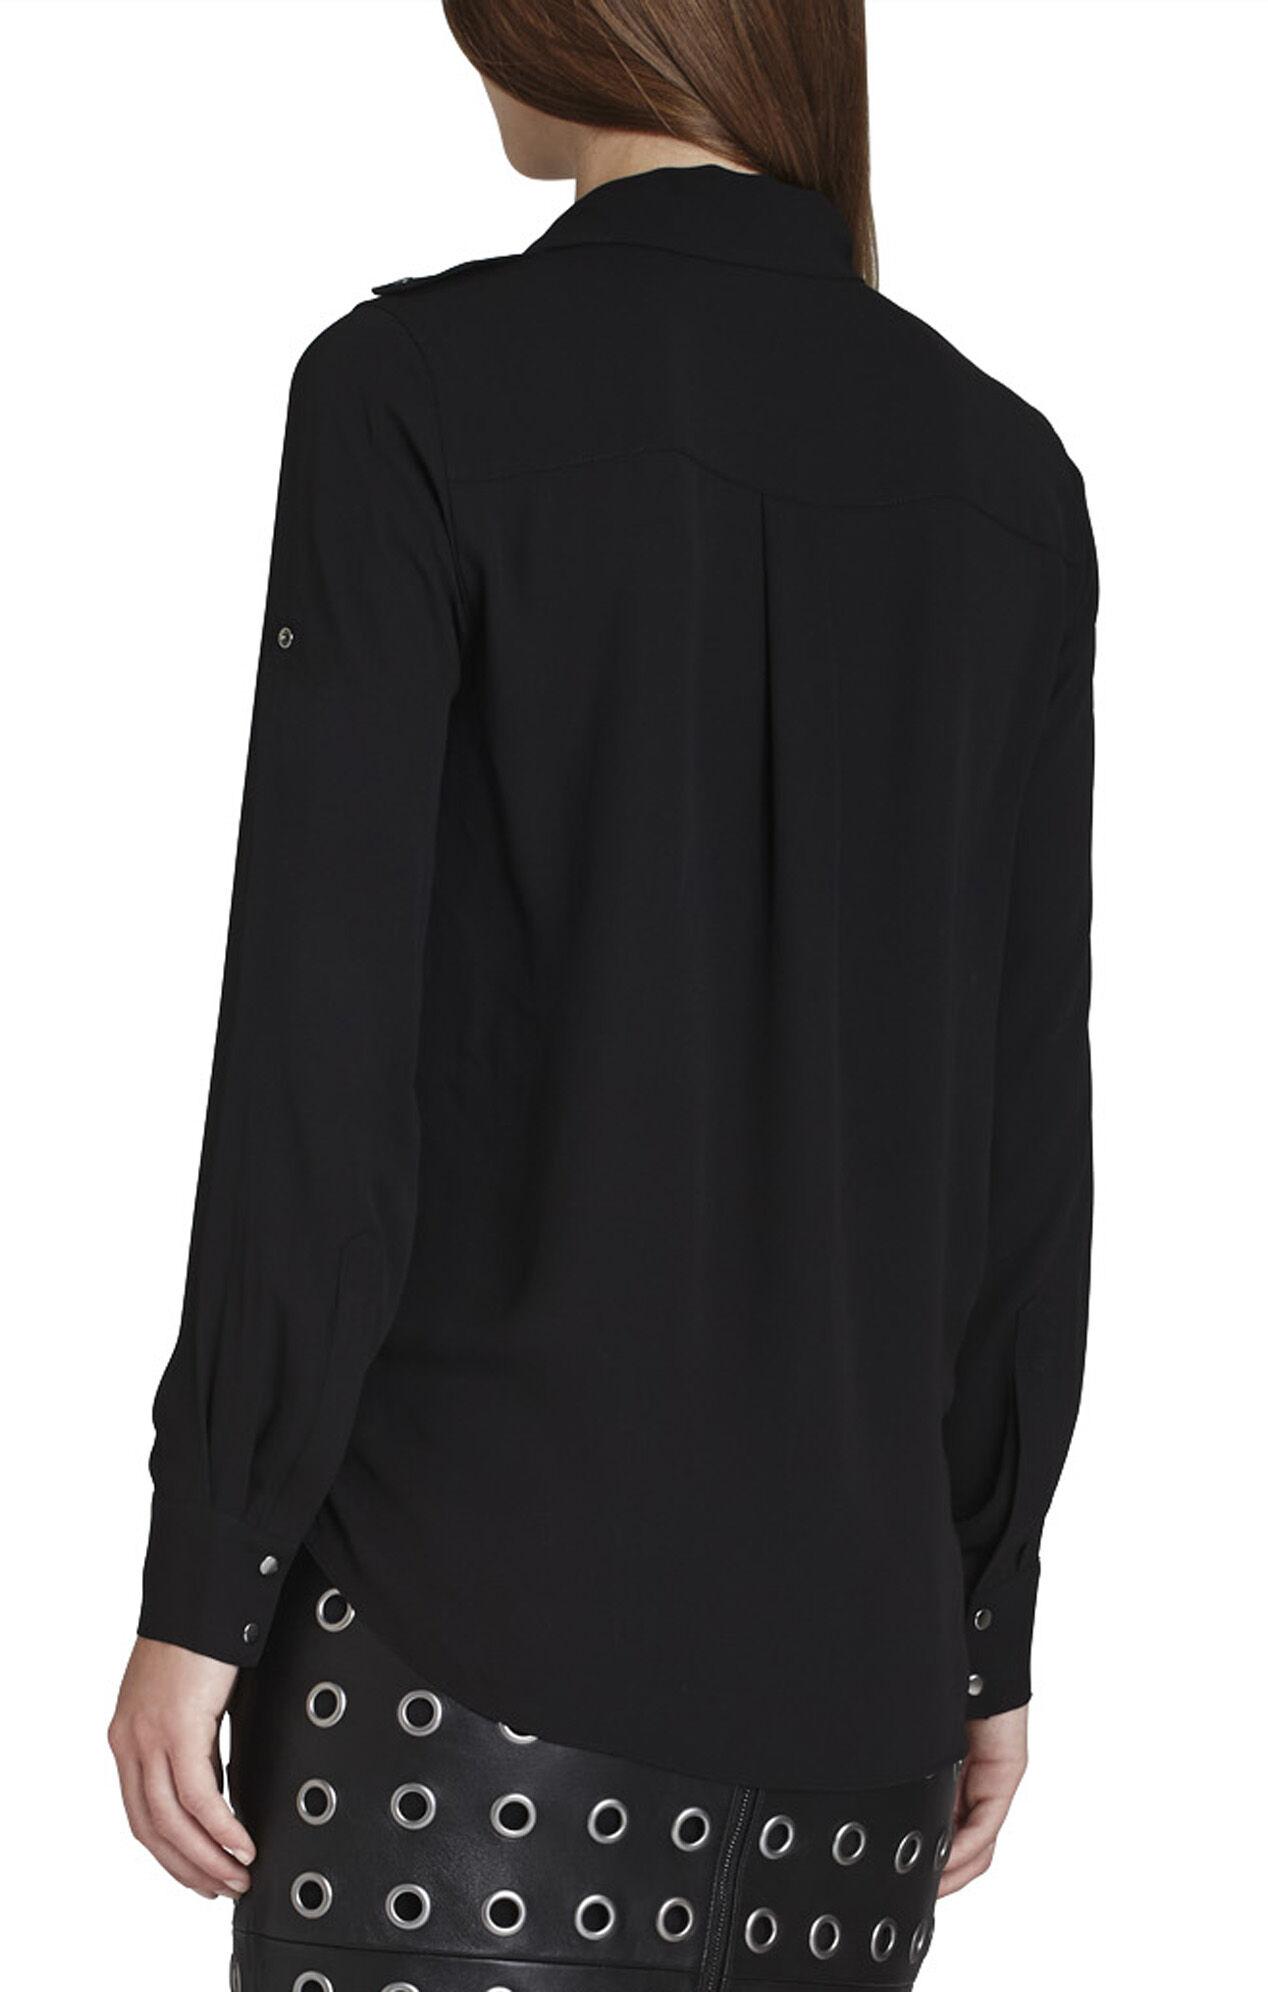 Sessilee Draped Long-Sleeve Shirt